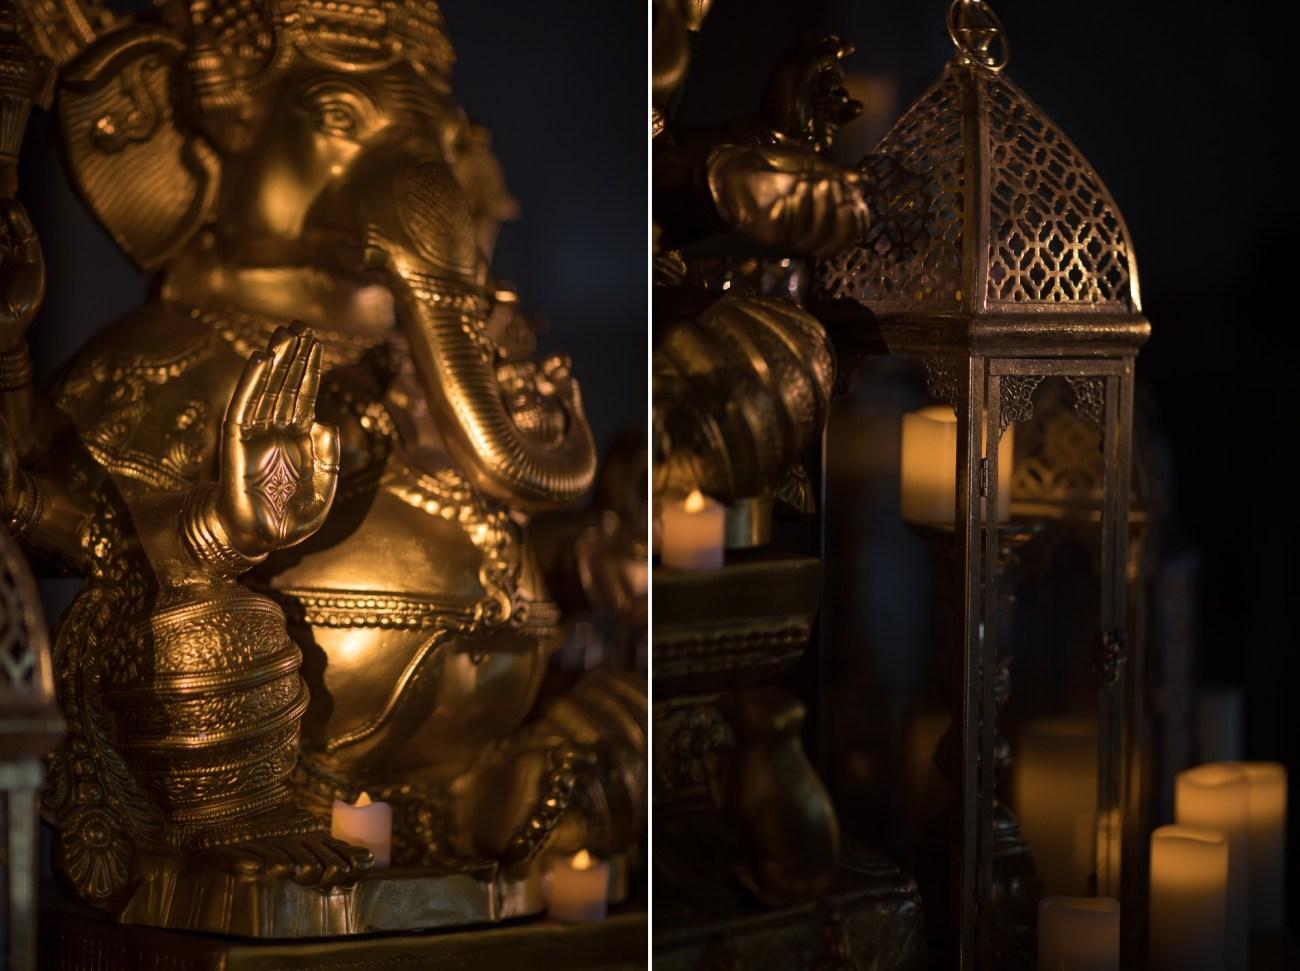 florida-indian-wedding-decorators-5 Indian Wedding Decoration in Florida   Ganesha Statue